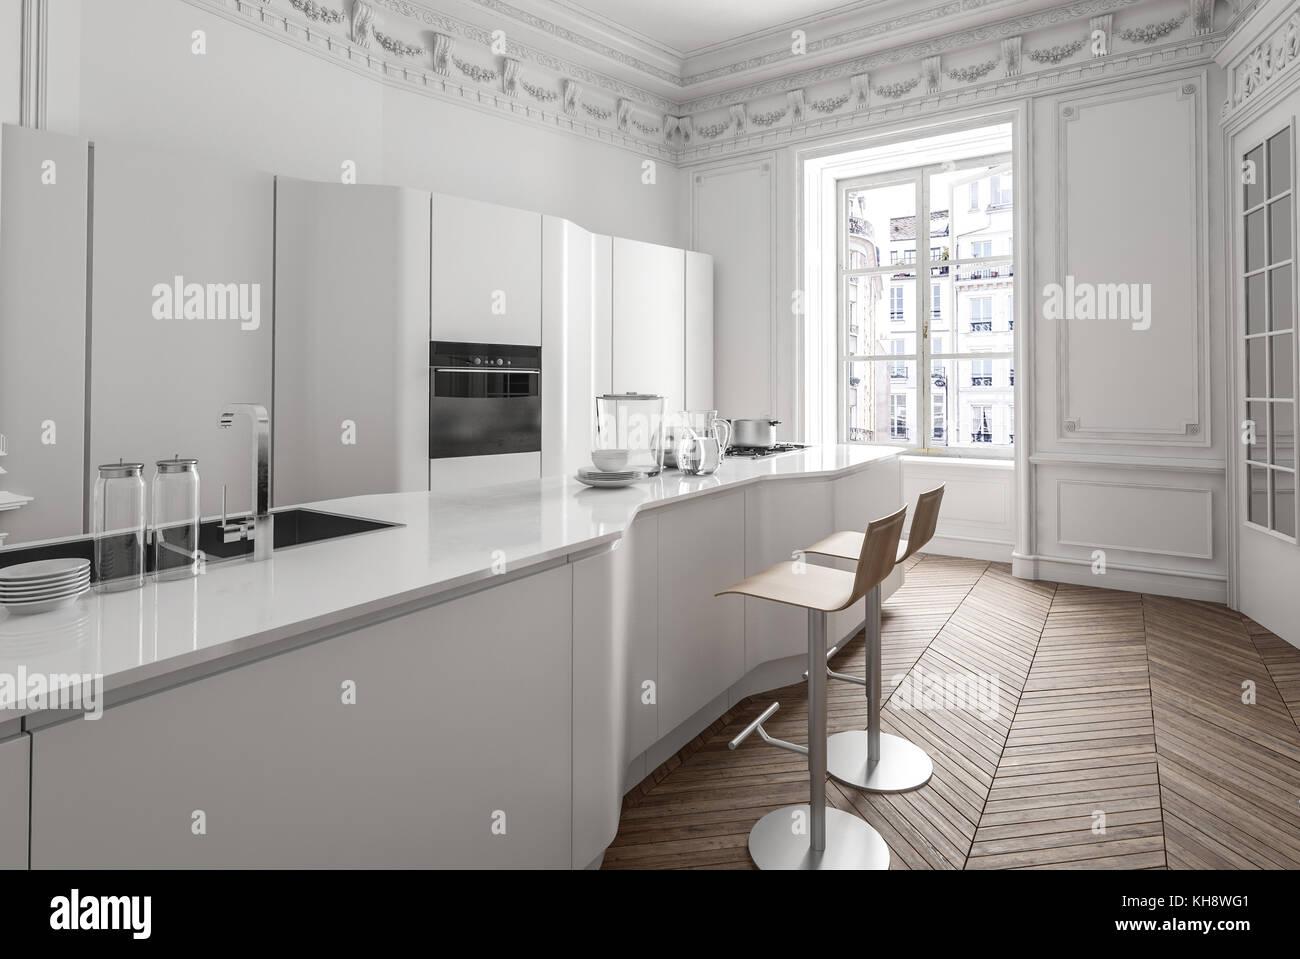 Appartement Classique Blanc Interieur Avec Cuisine Equipee